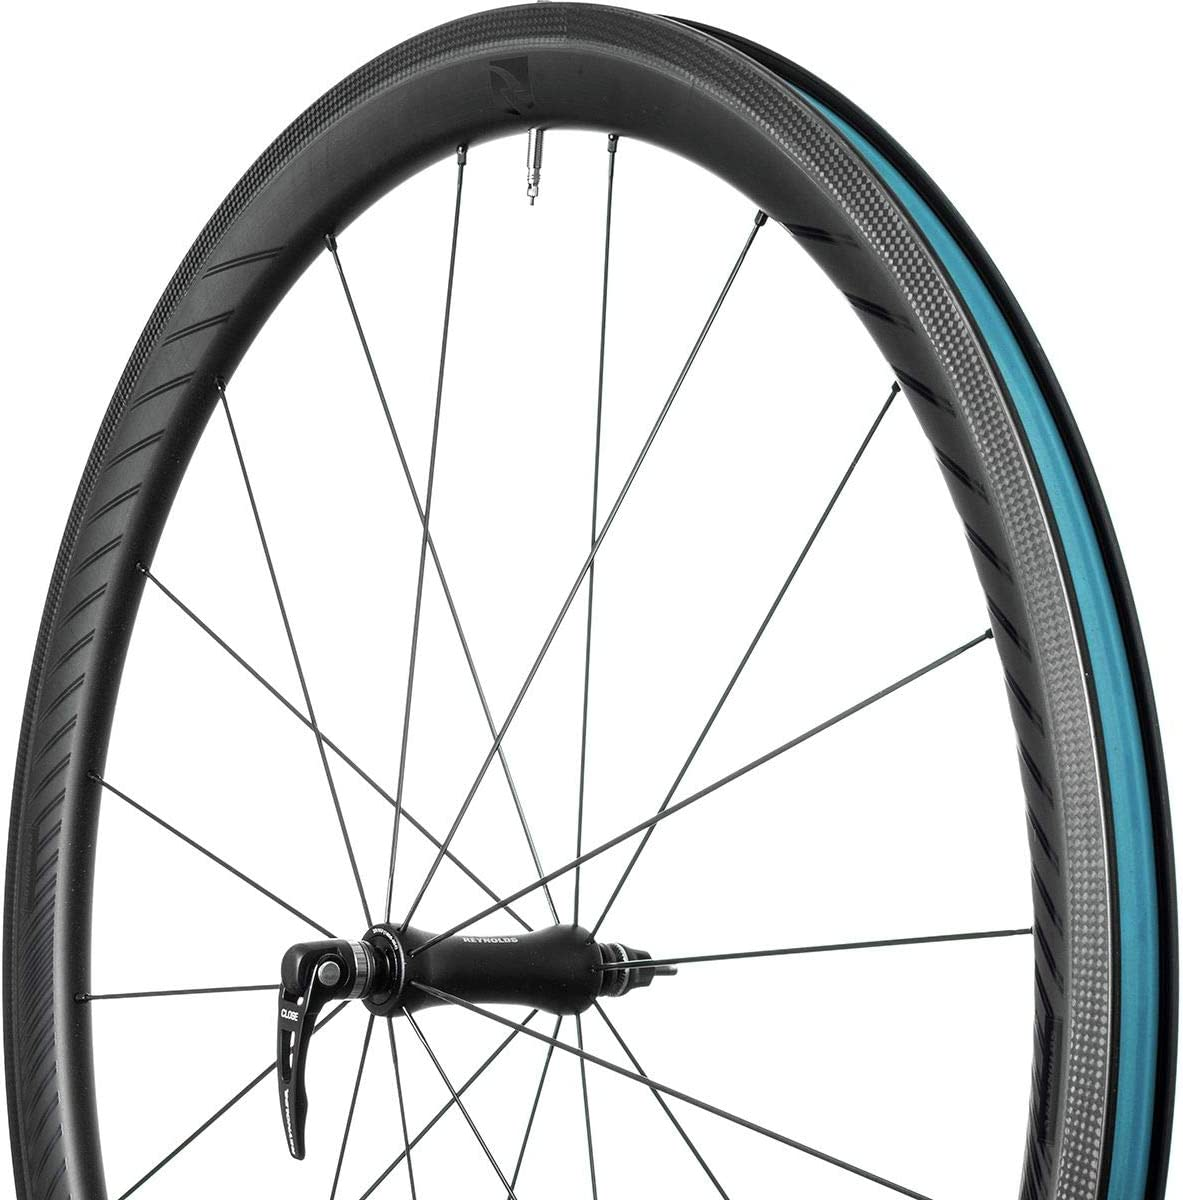 Reynolds AR41x Carbon Wheelset - Tubeless